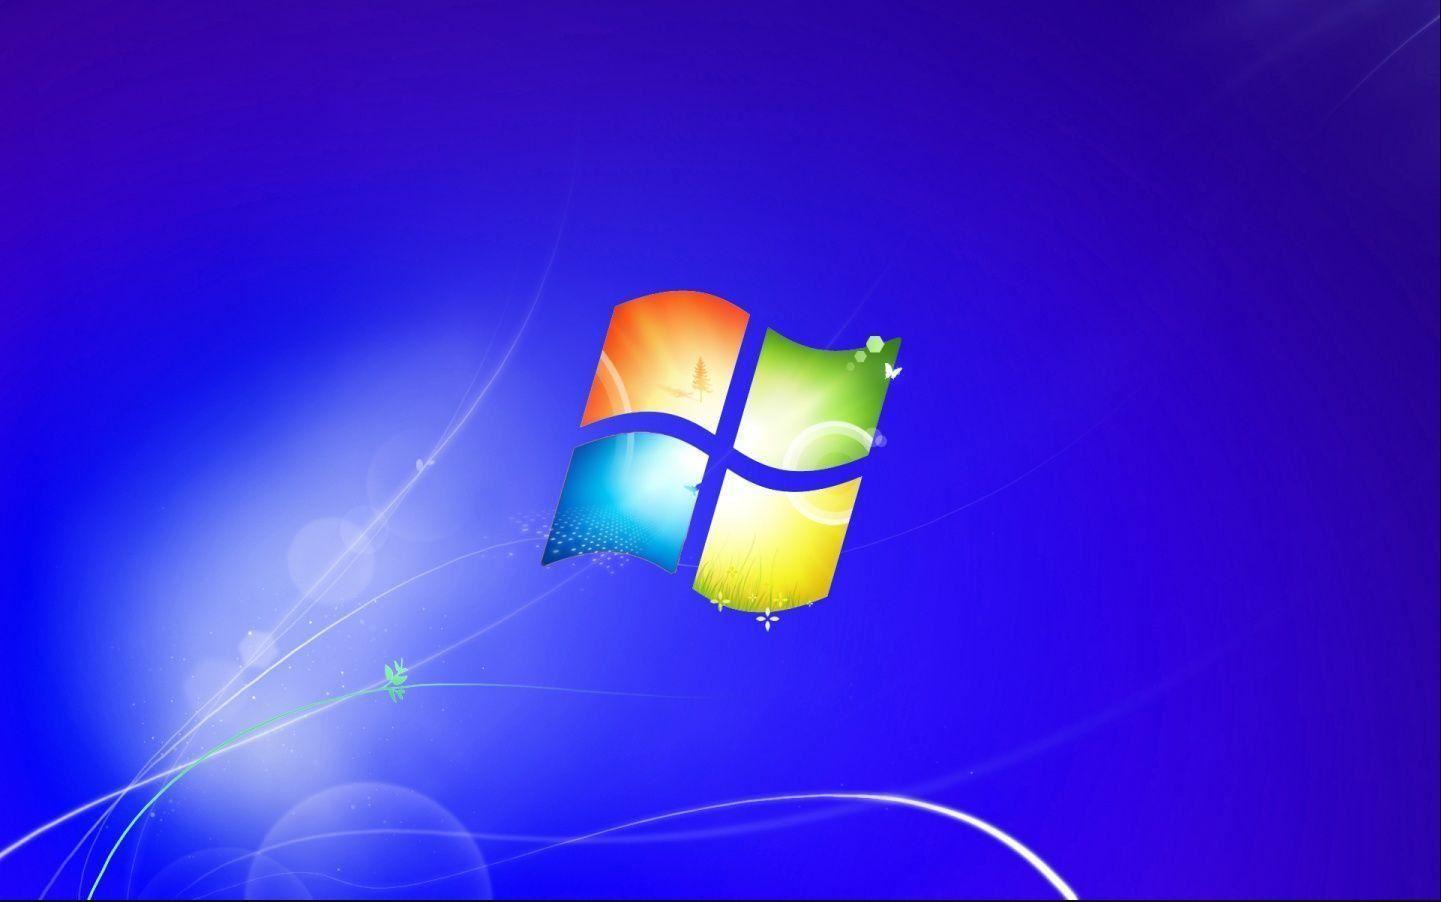 Fondo y logo Windows 7